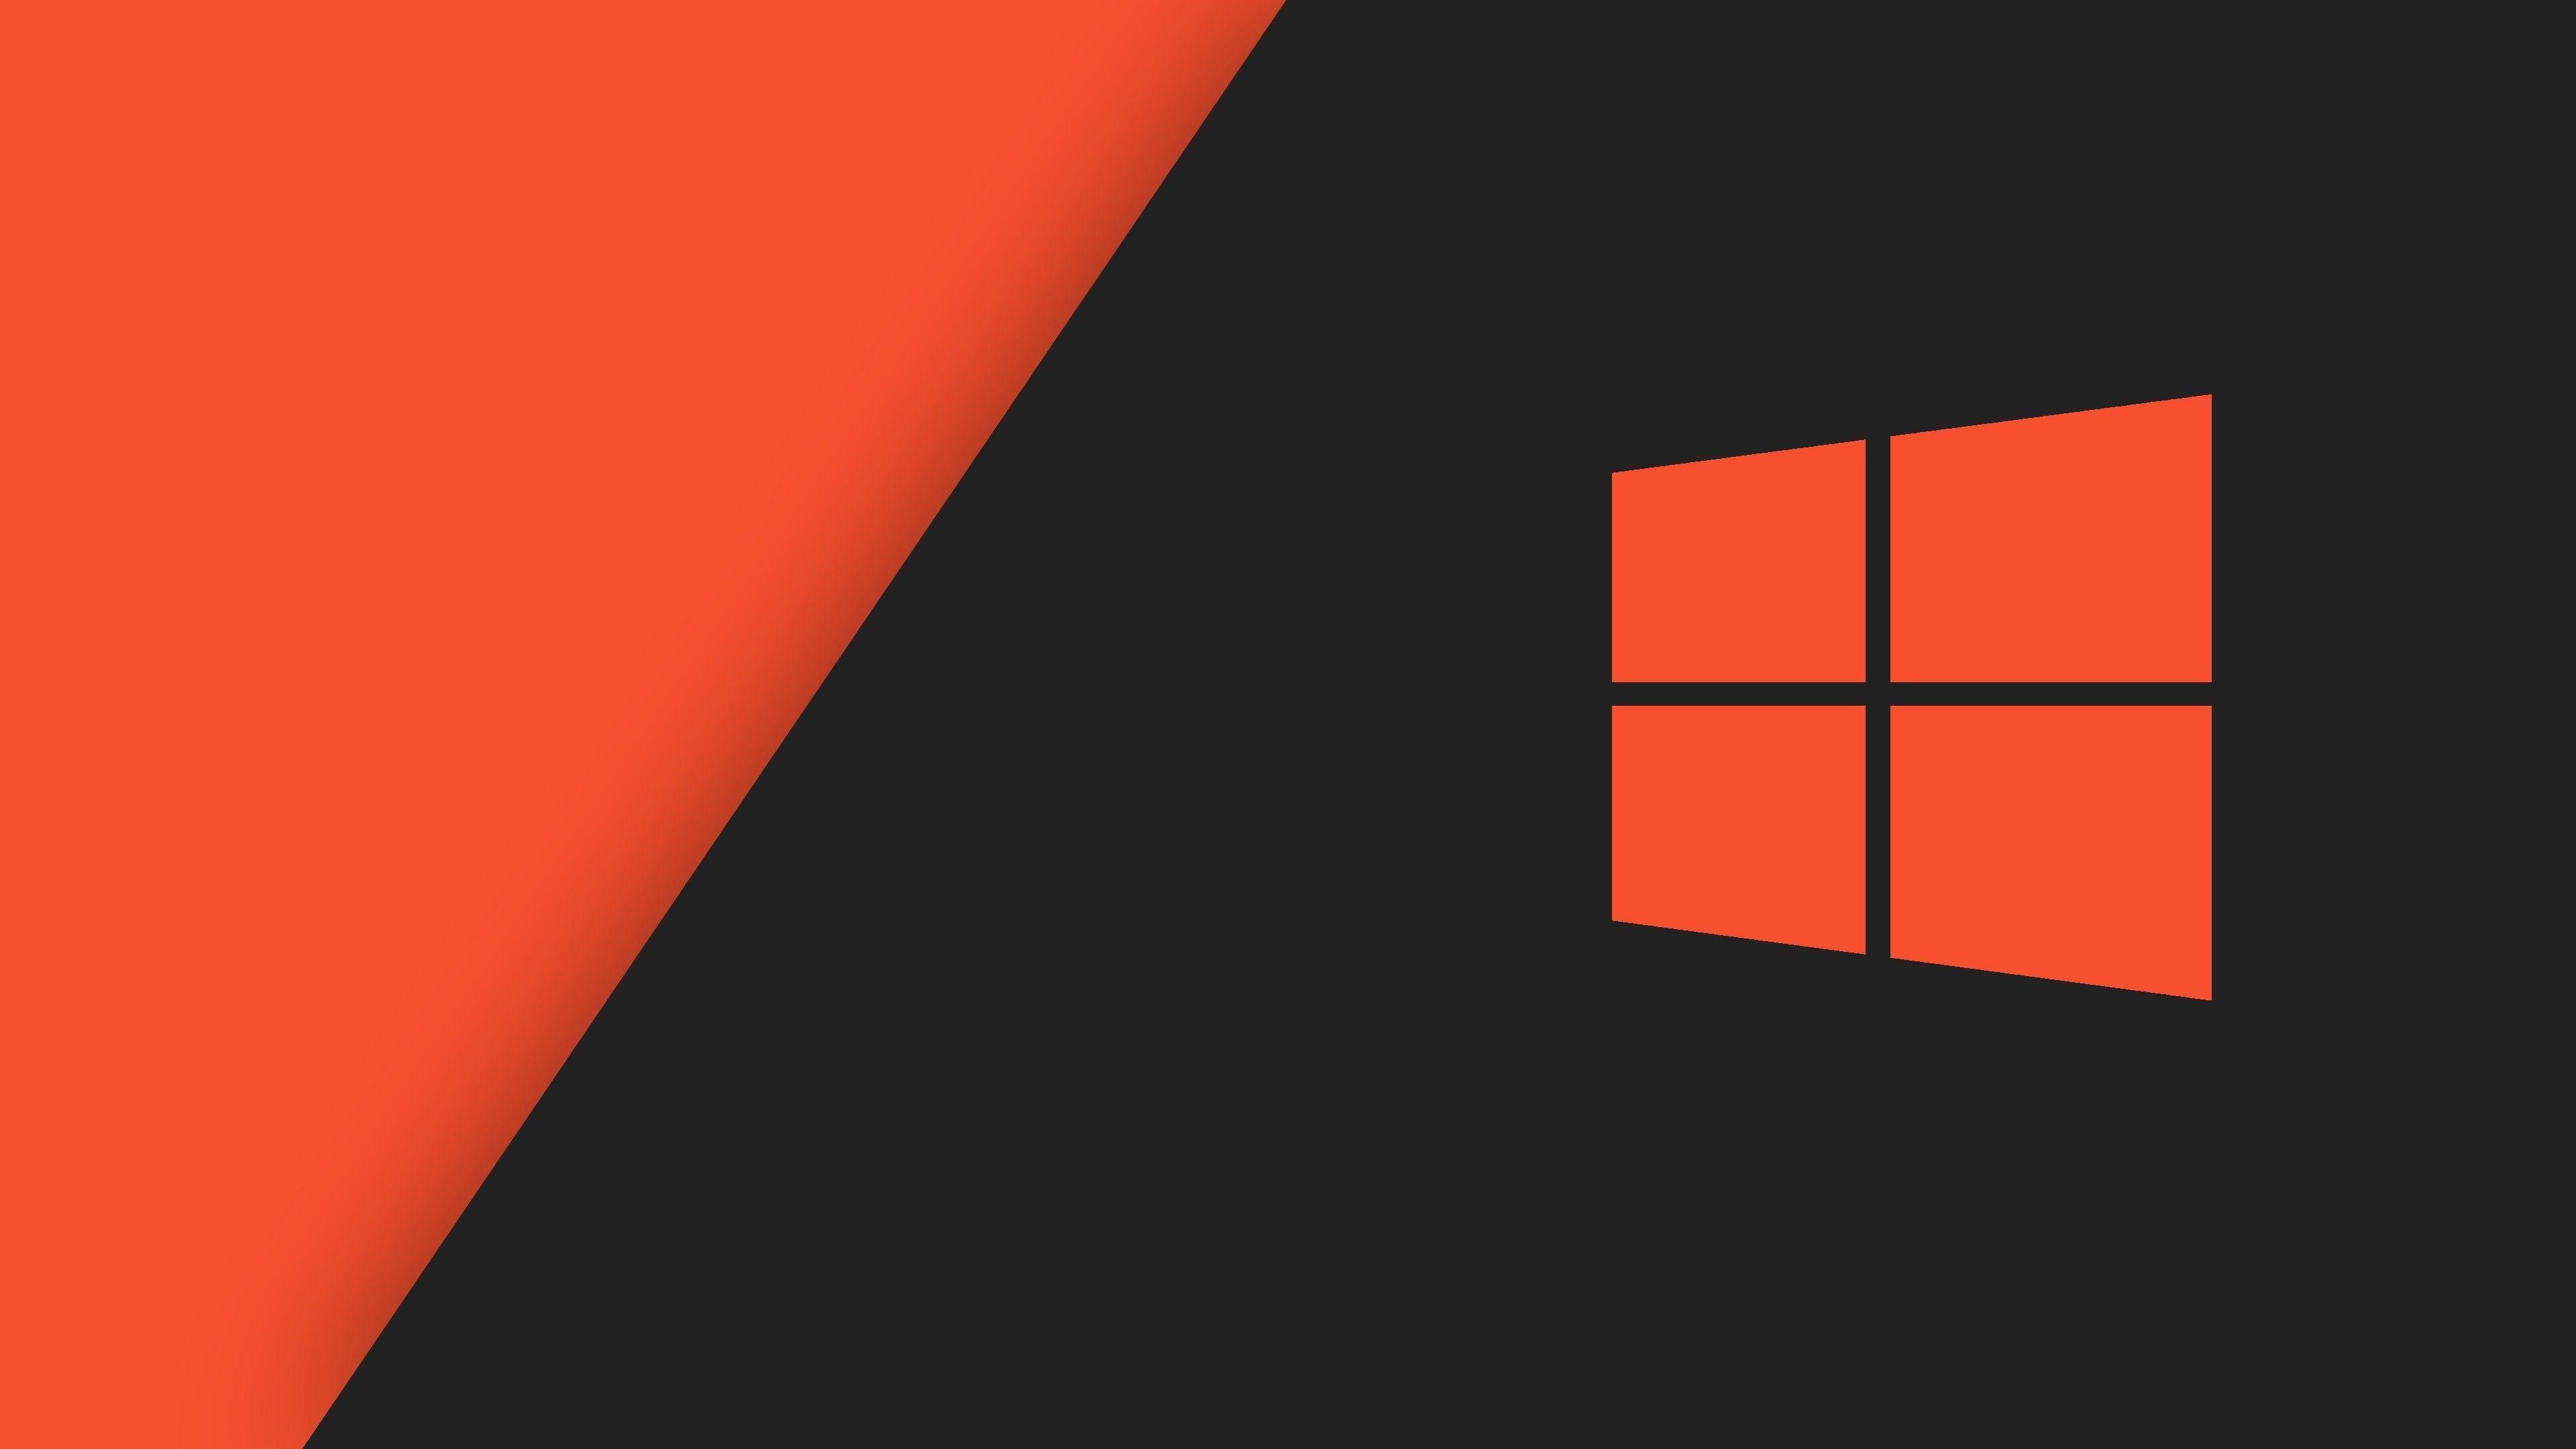 New Windows Logo Red 4k Wallpaper Windows 10 Samsung Wallpaper Uhd Wallpaper